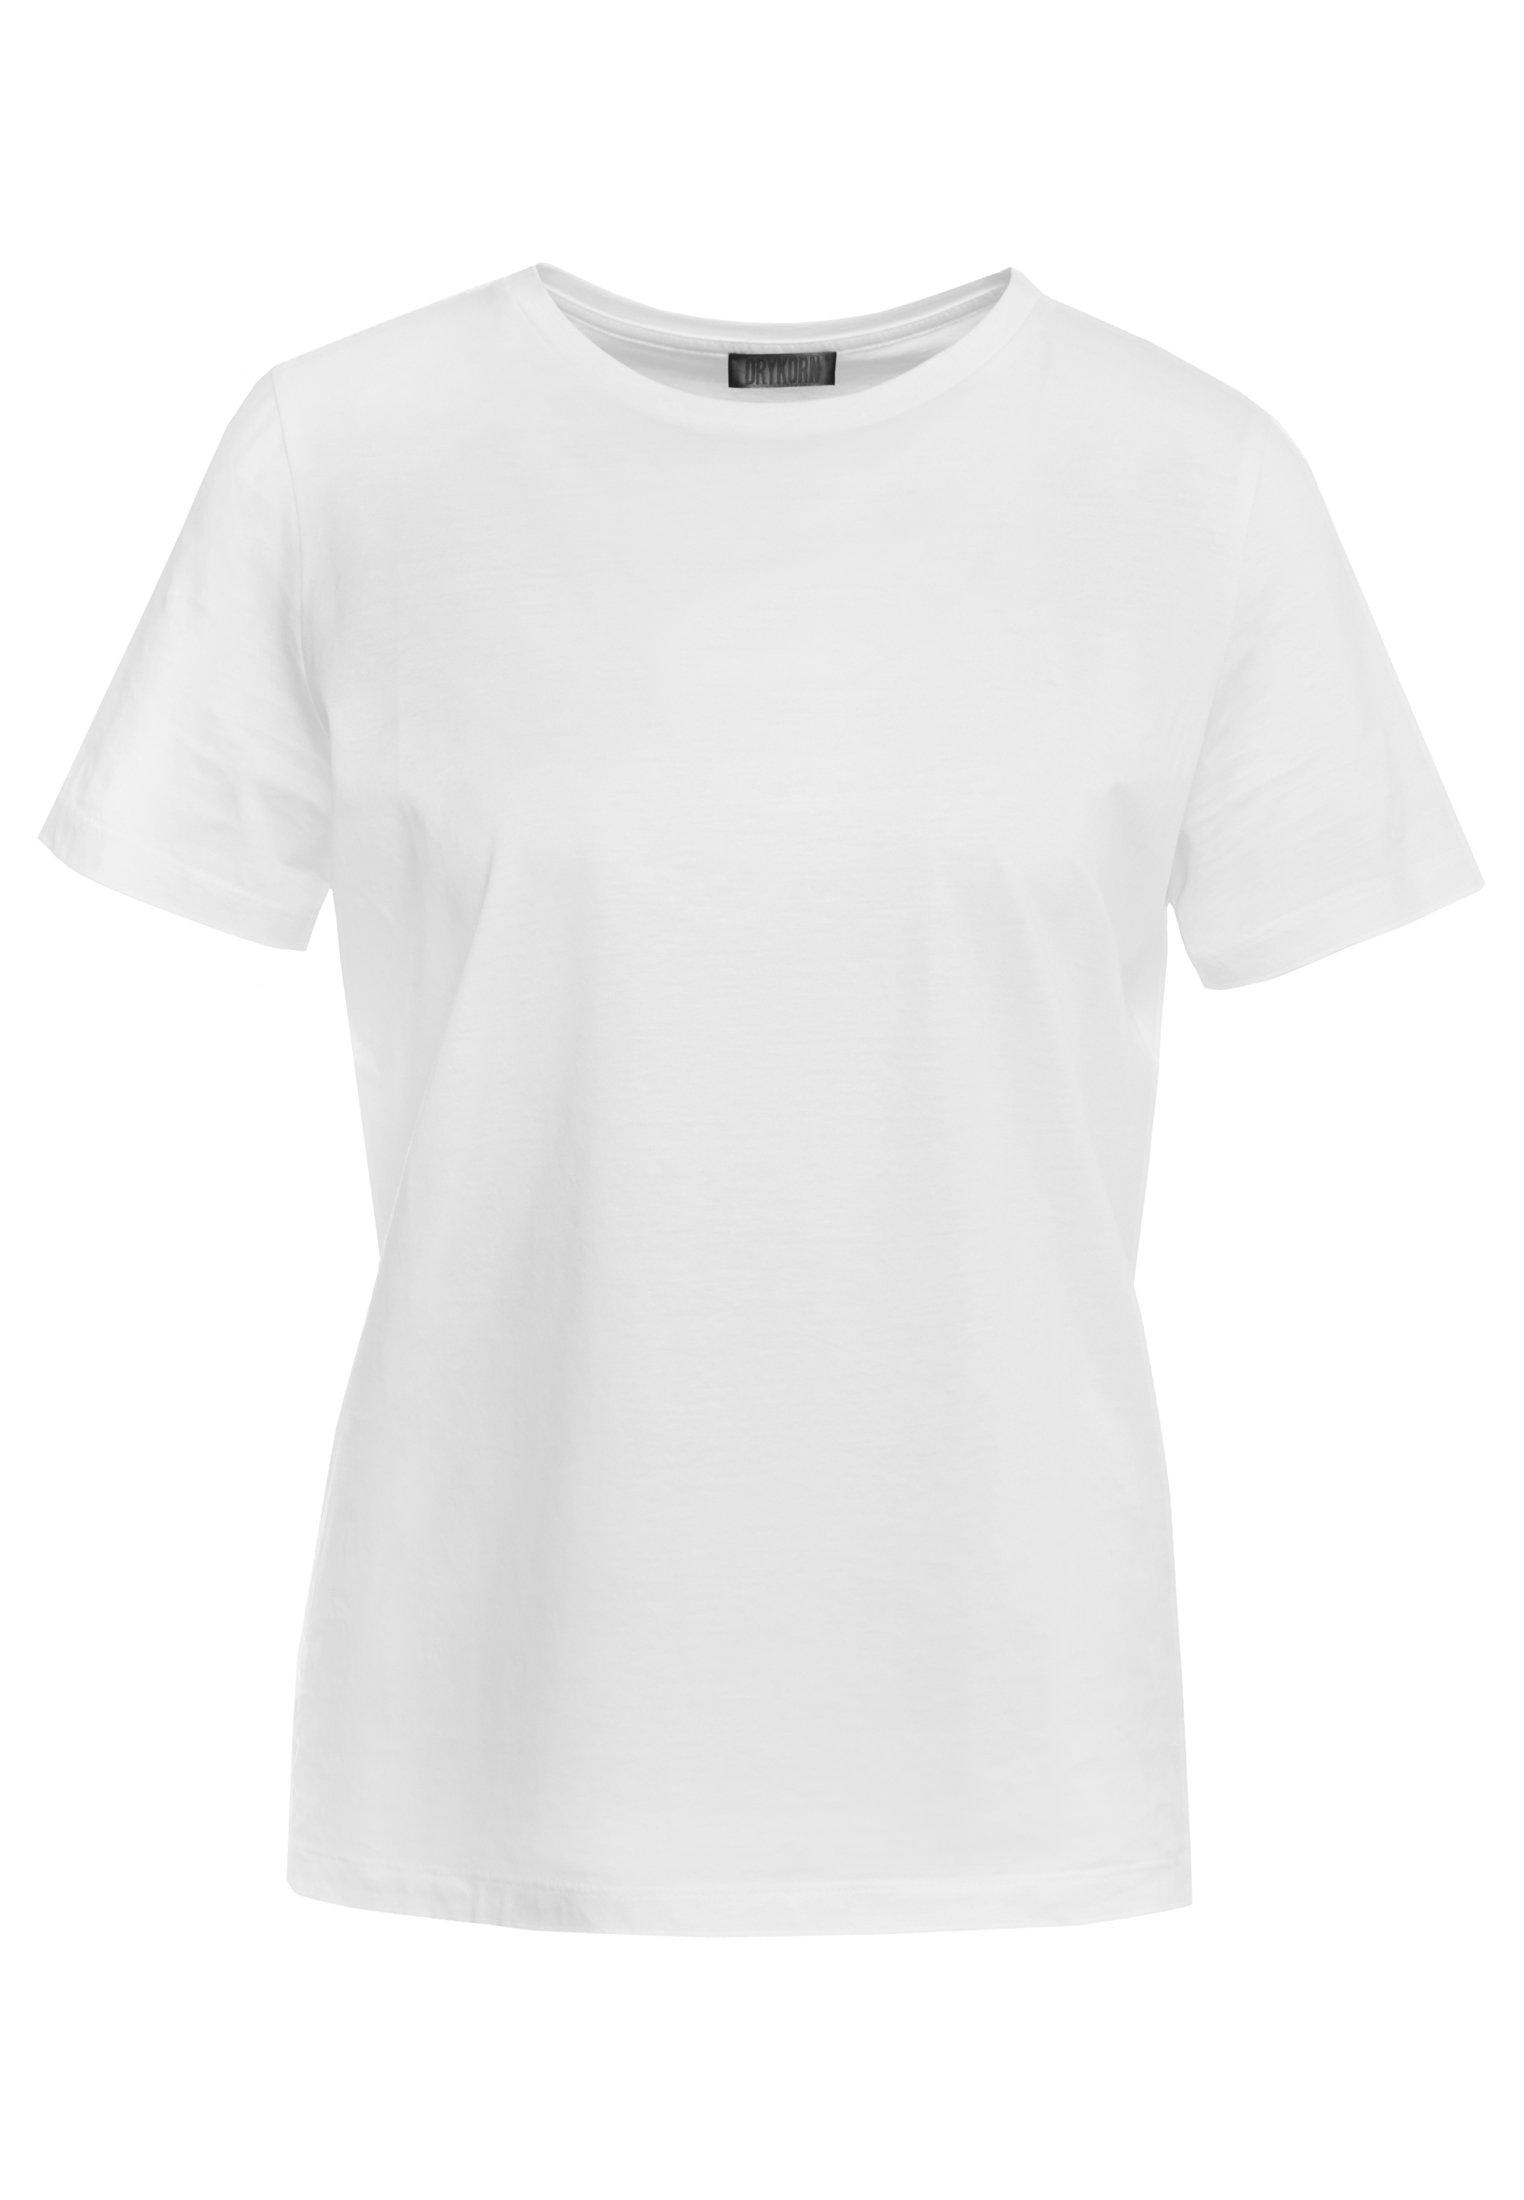 Drykorn Anisia - T-shirts White/hvit